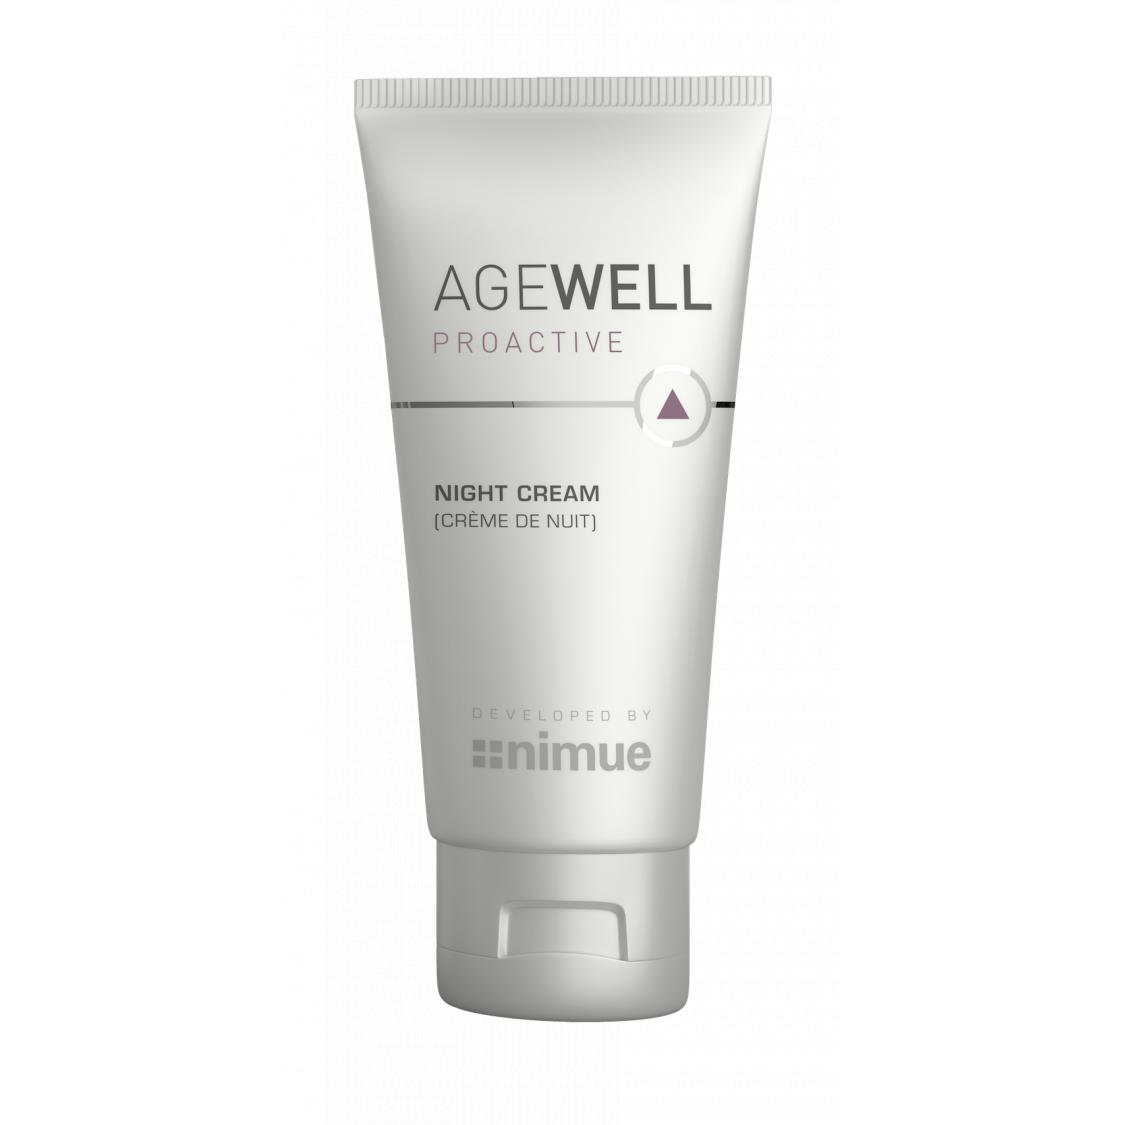 Agewell - Proactive Night Cream 20's 50ml